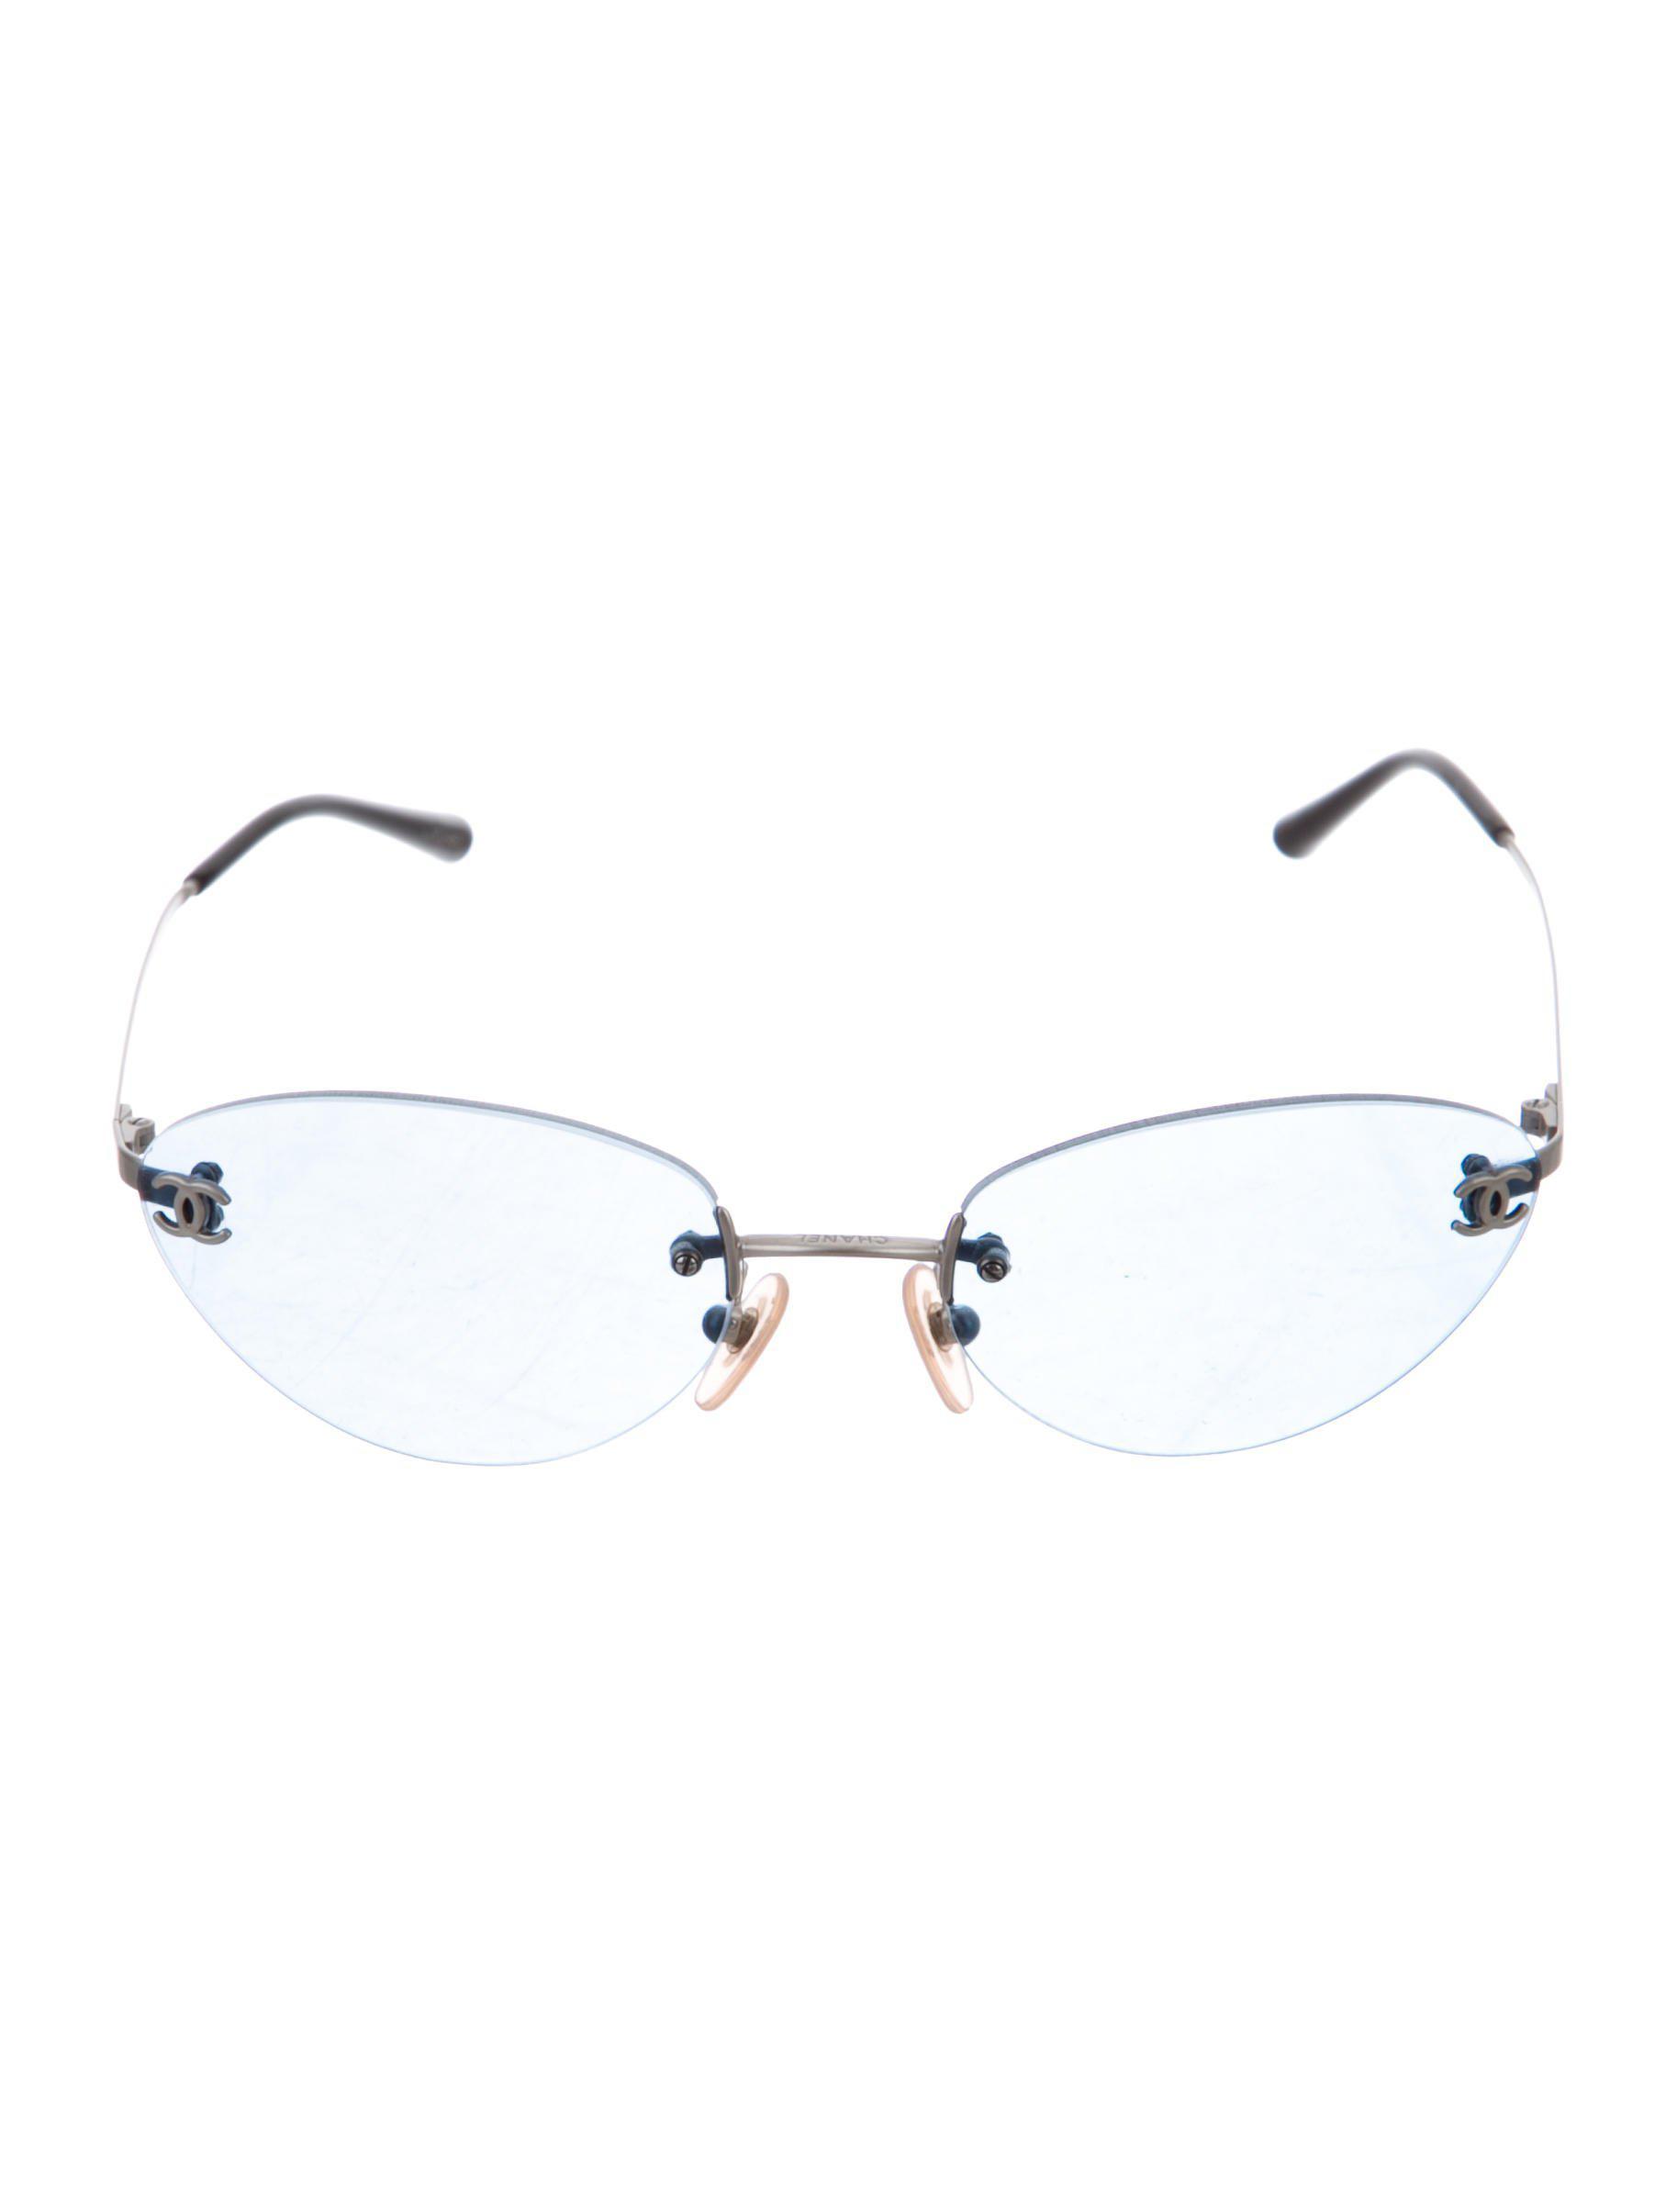 cd87ff247d7 Chanel - Metallic Rimless Cc Sunglasses Silver - Lyst. View fullscreen